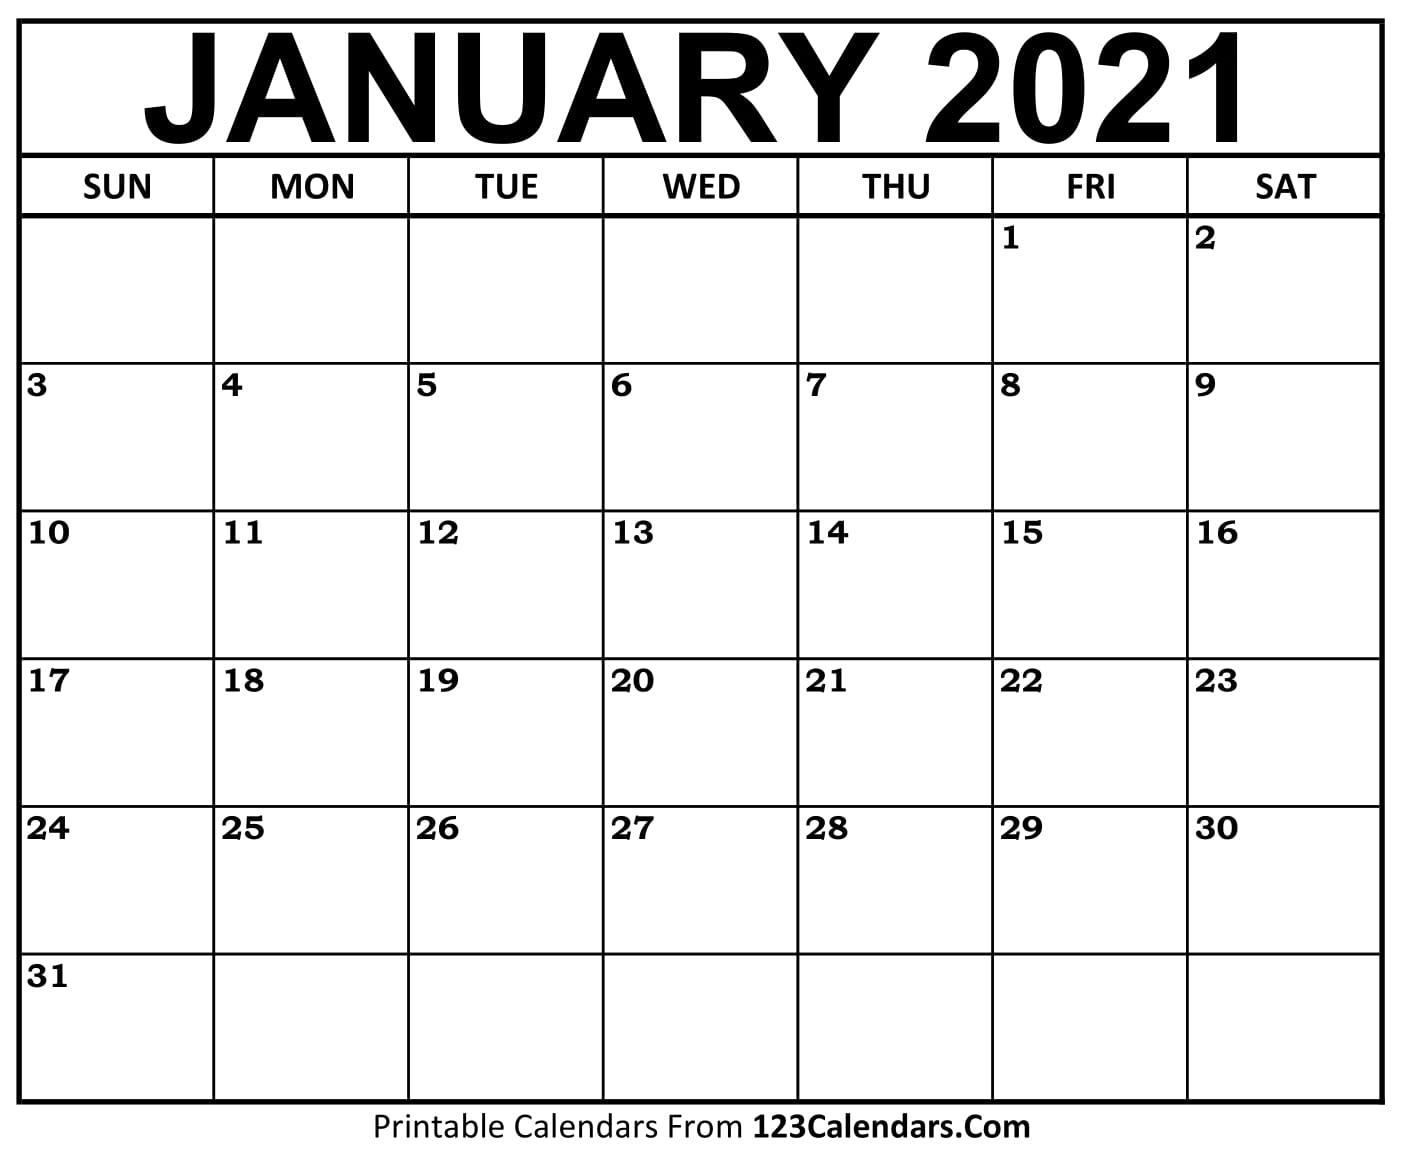 Printable January 2021 Calendar Templates | 123Calendars